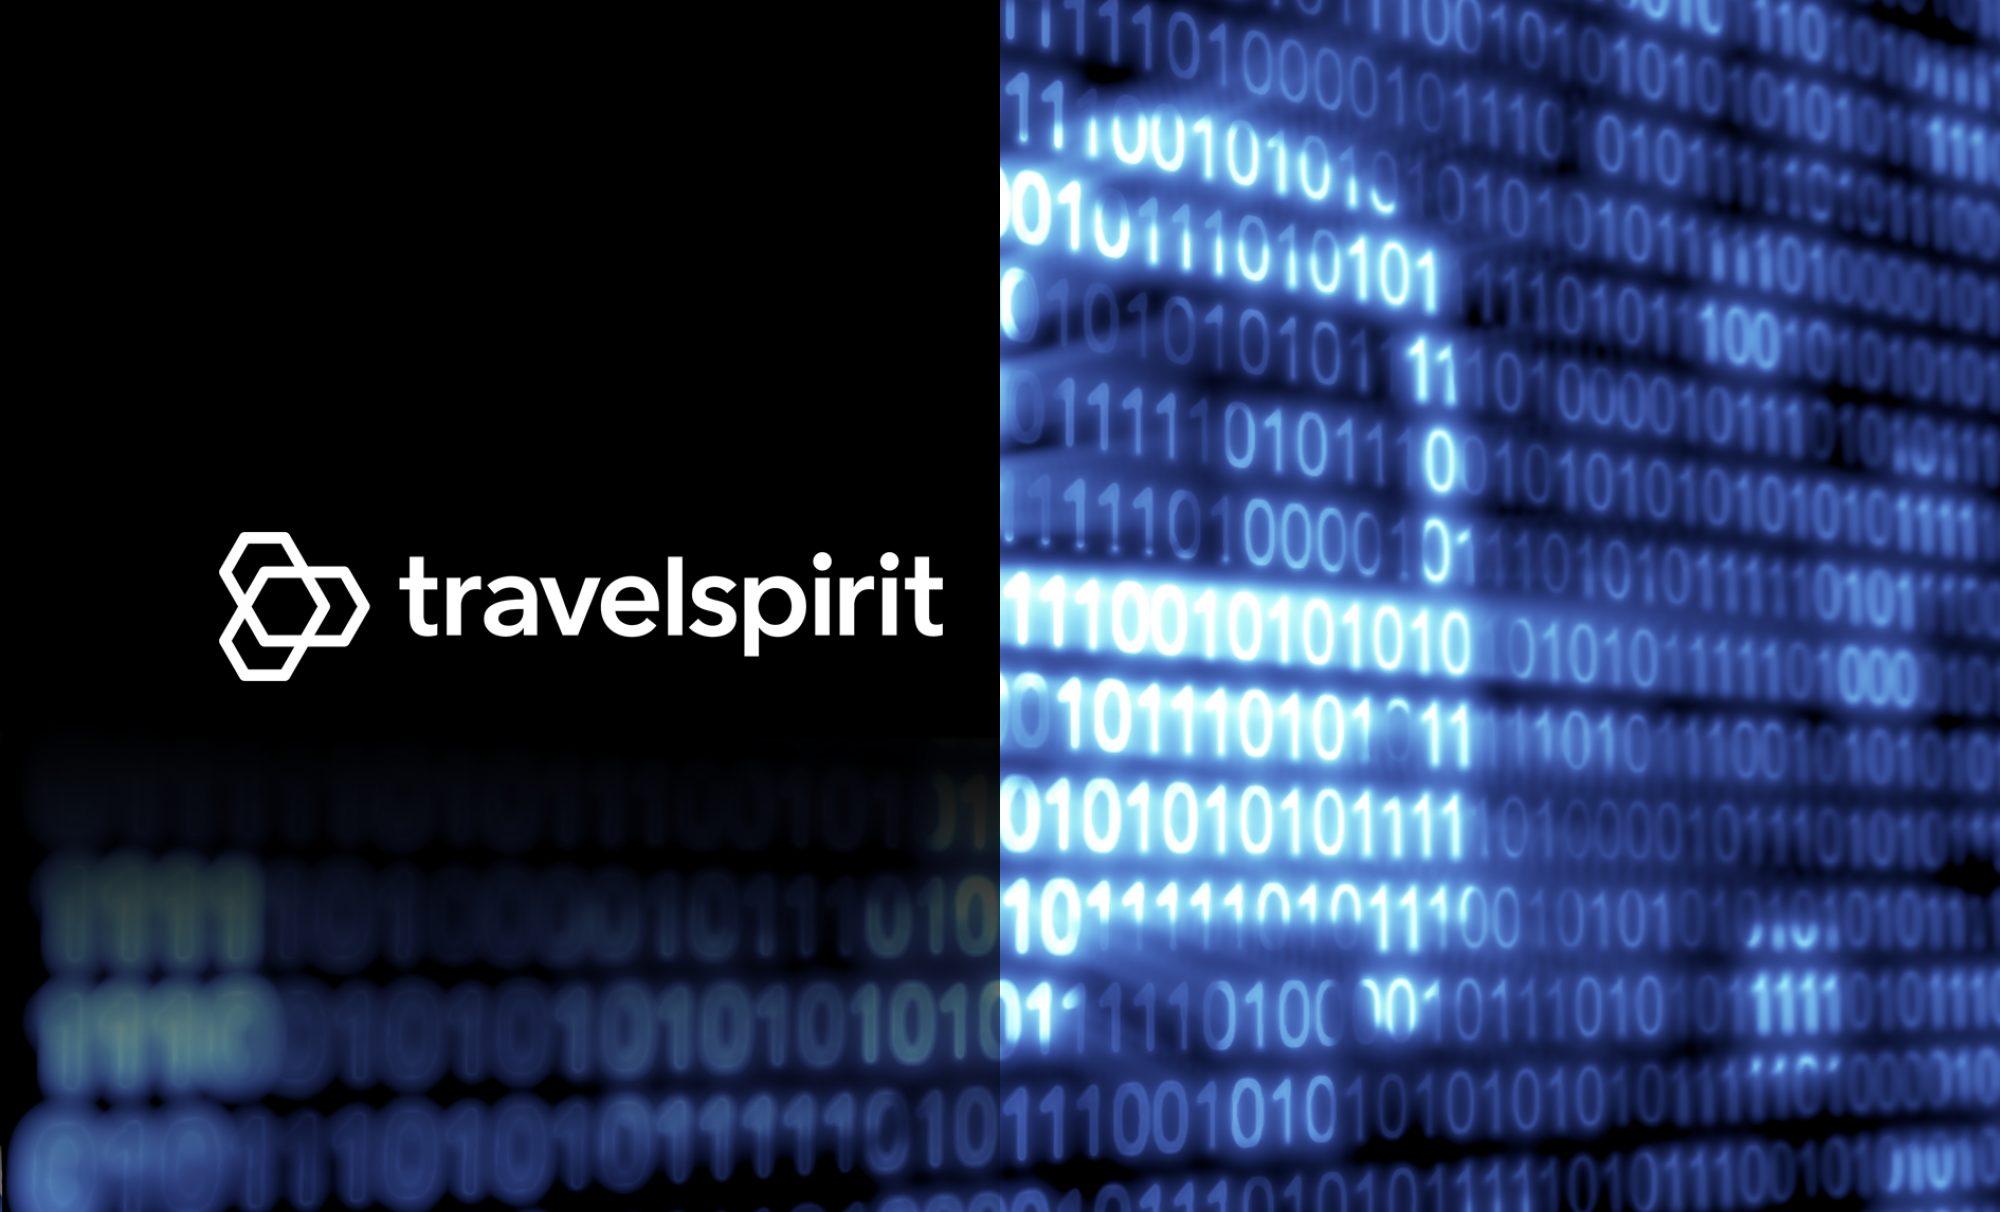 TravelSpirit